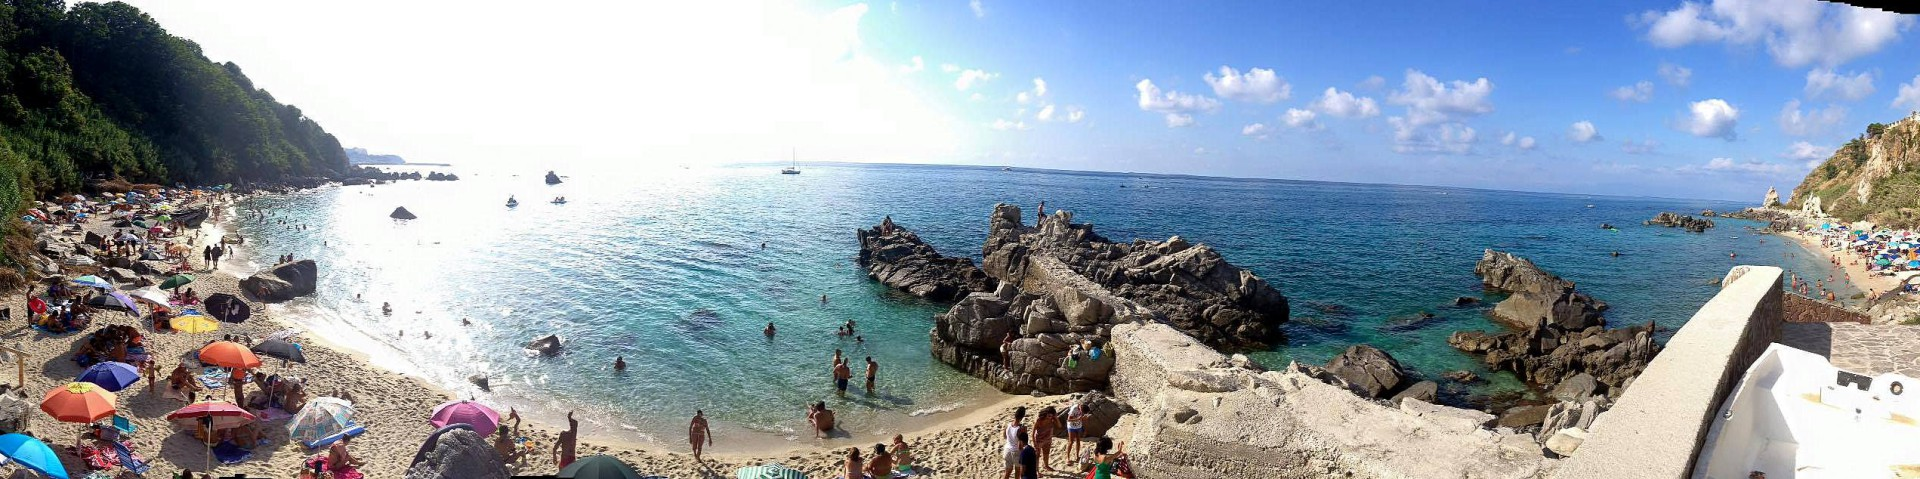 Parghelia, pláž Michelino